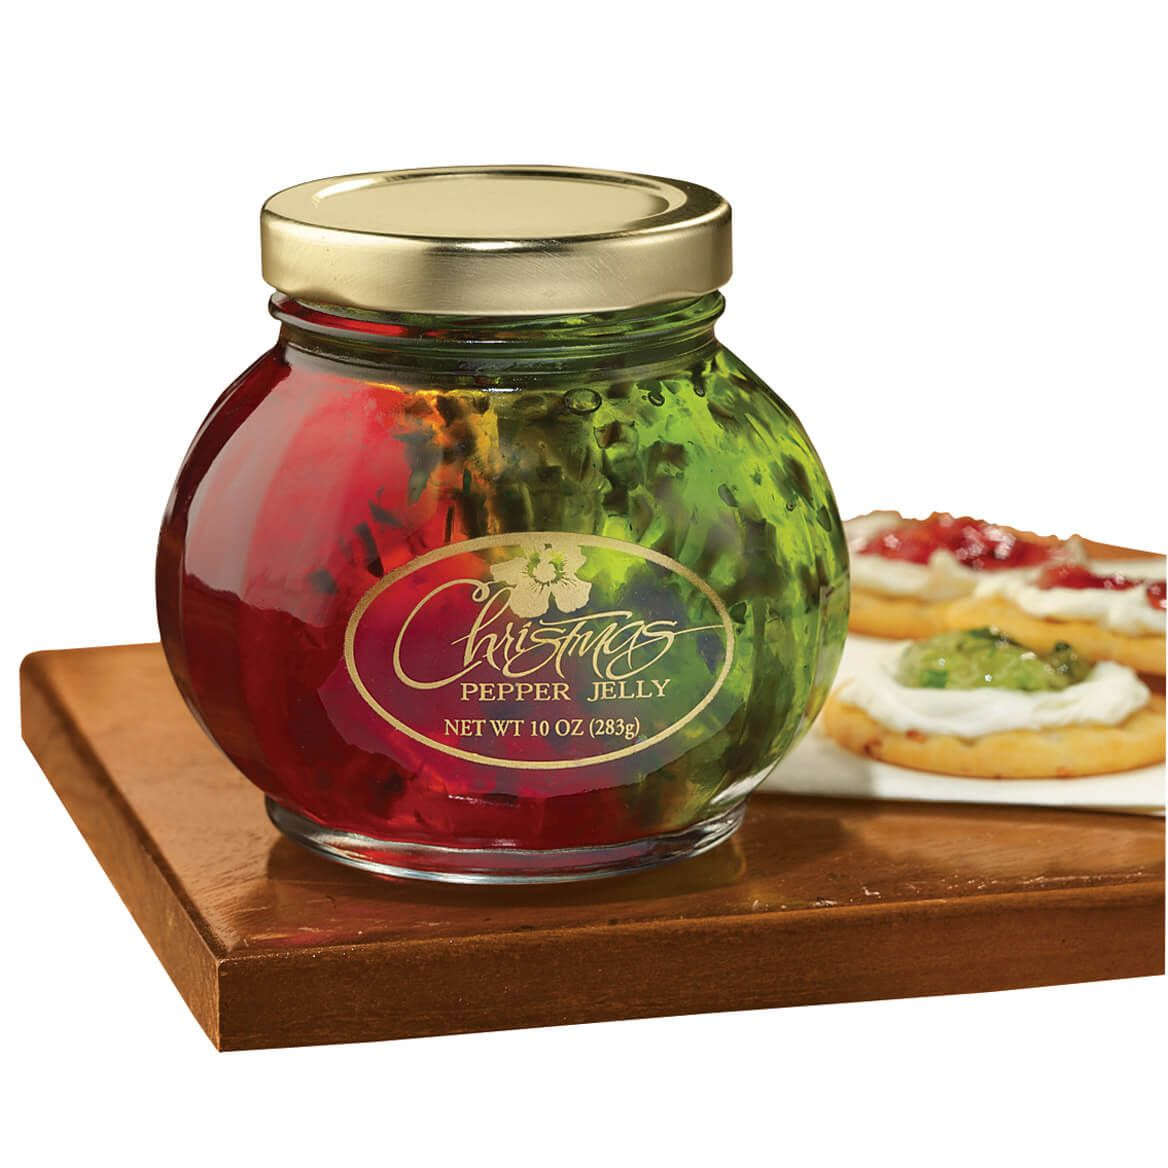 Christmas Pepper Jelly Jar 10 oz-327296